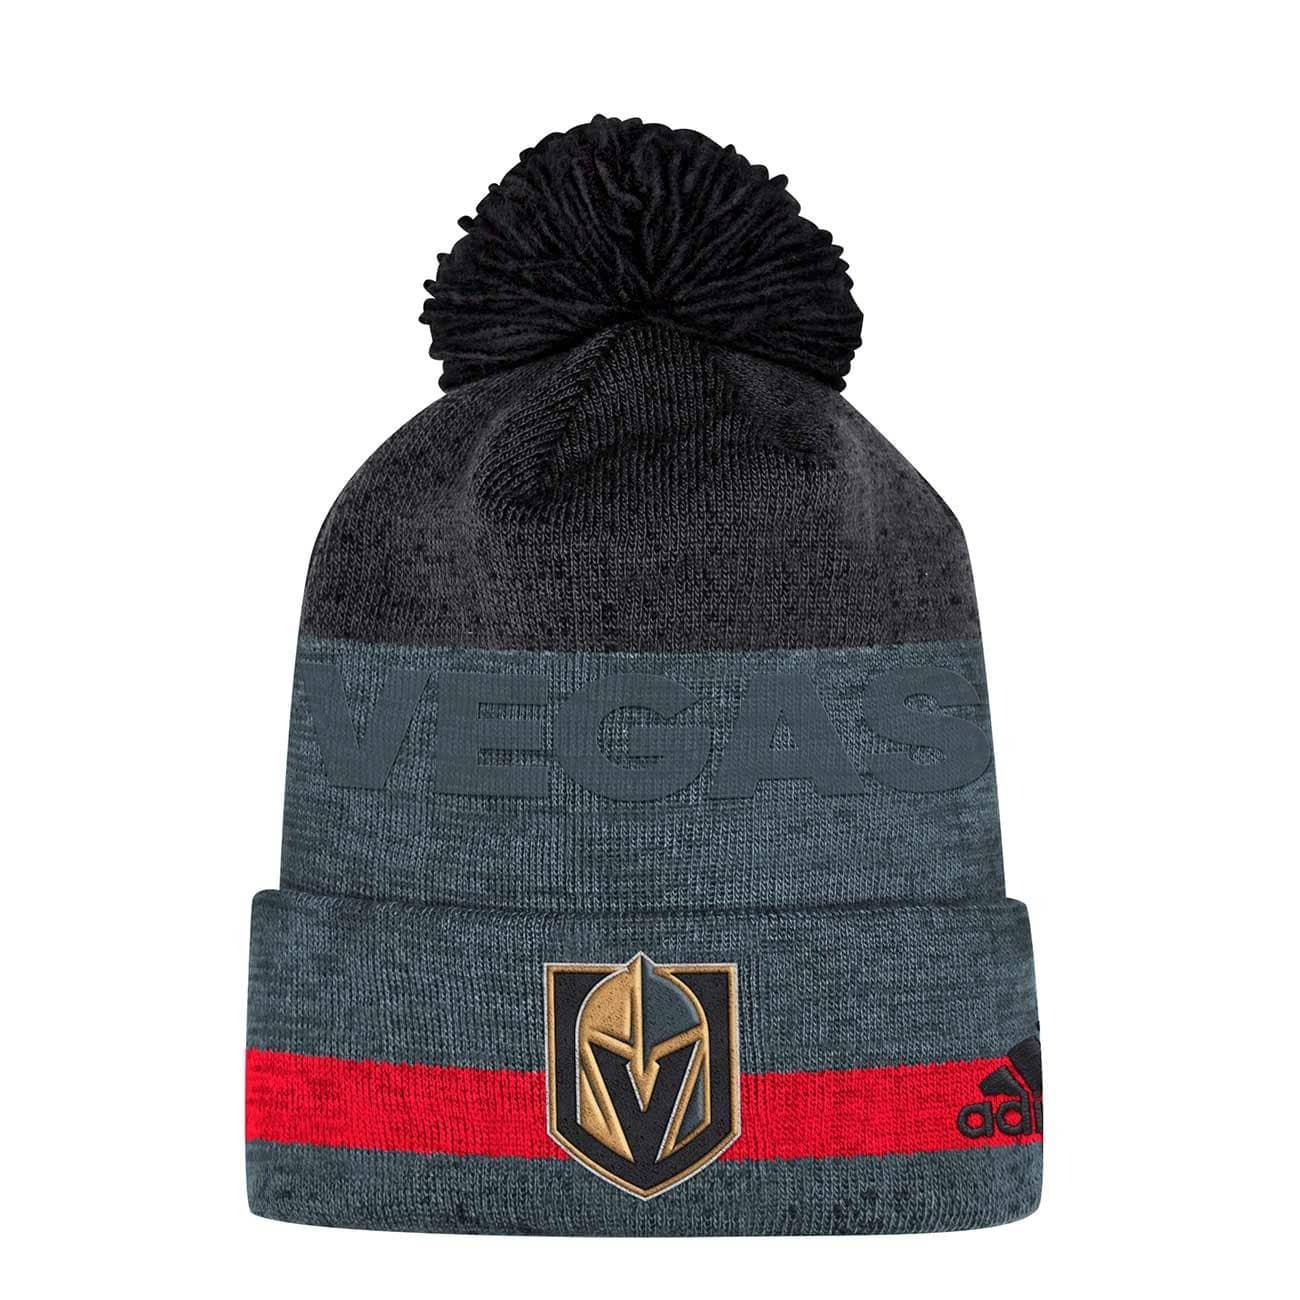 373626342f7 adidas Vegas Golden Knights Juliet Cuffed Beanie NHL Knit Hat ...